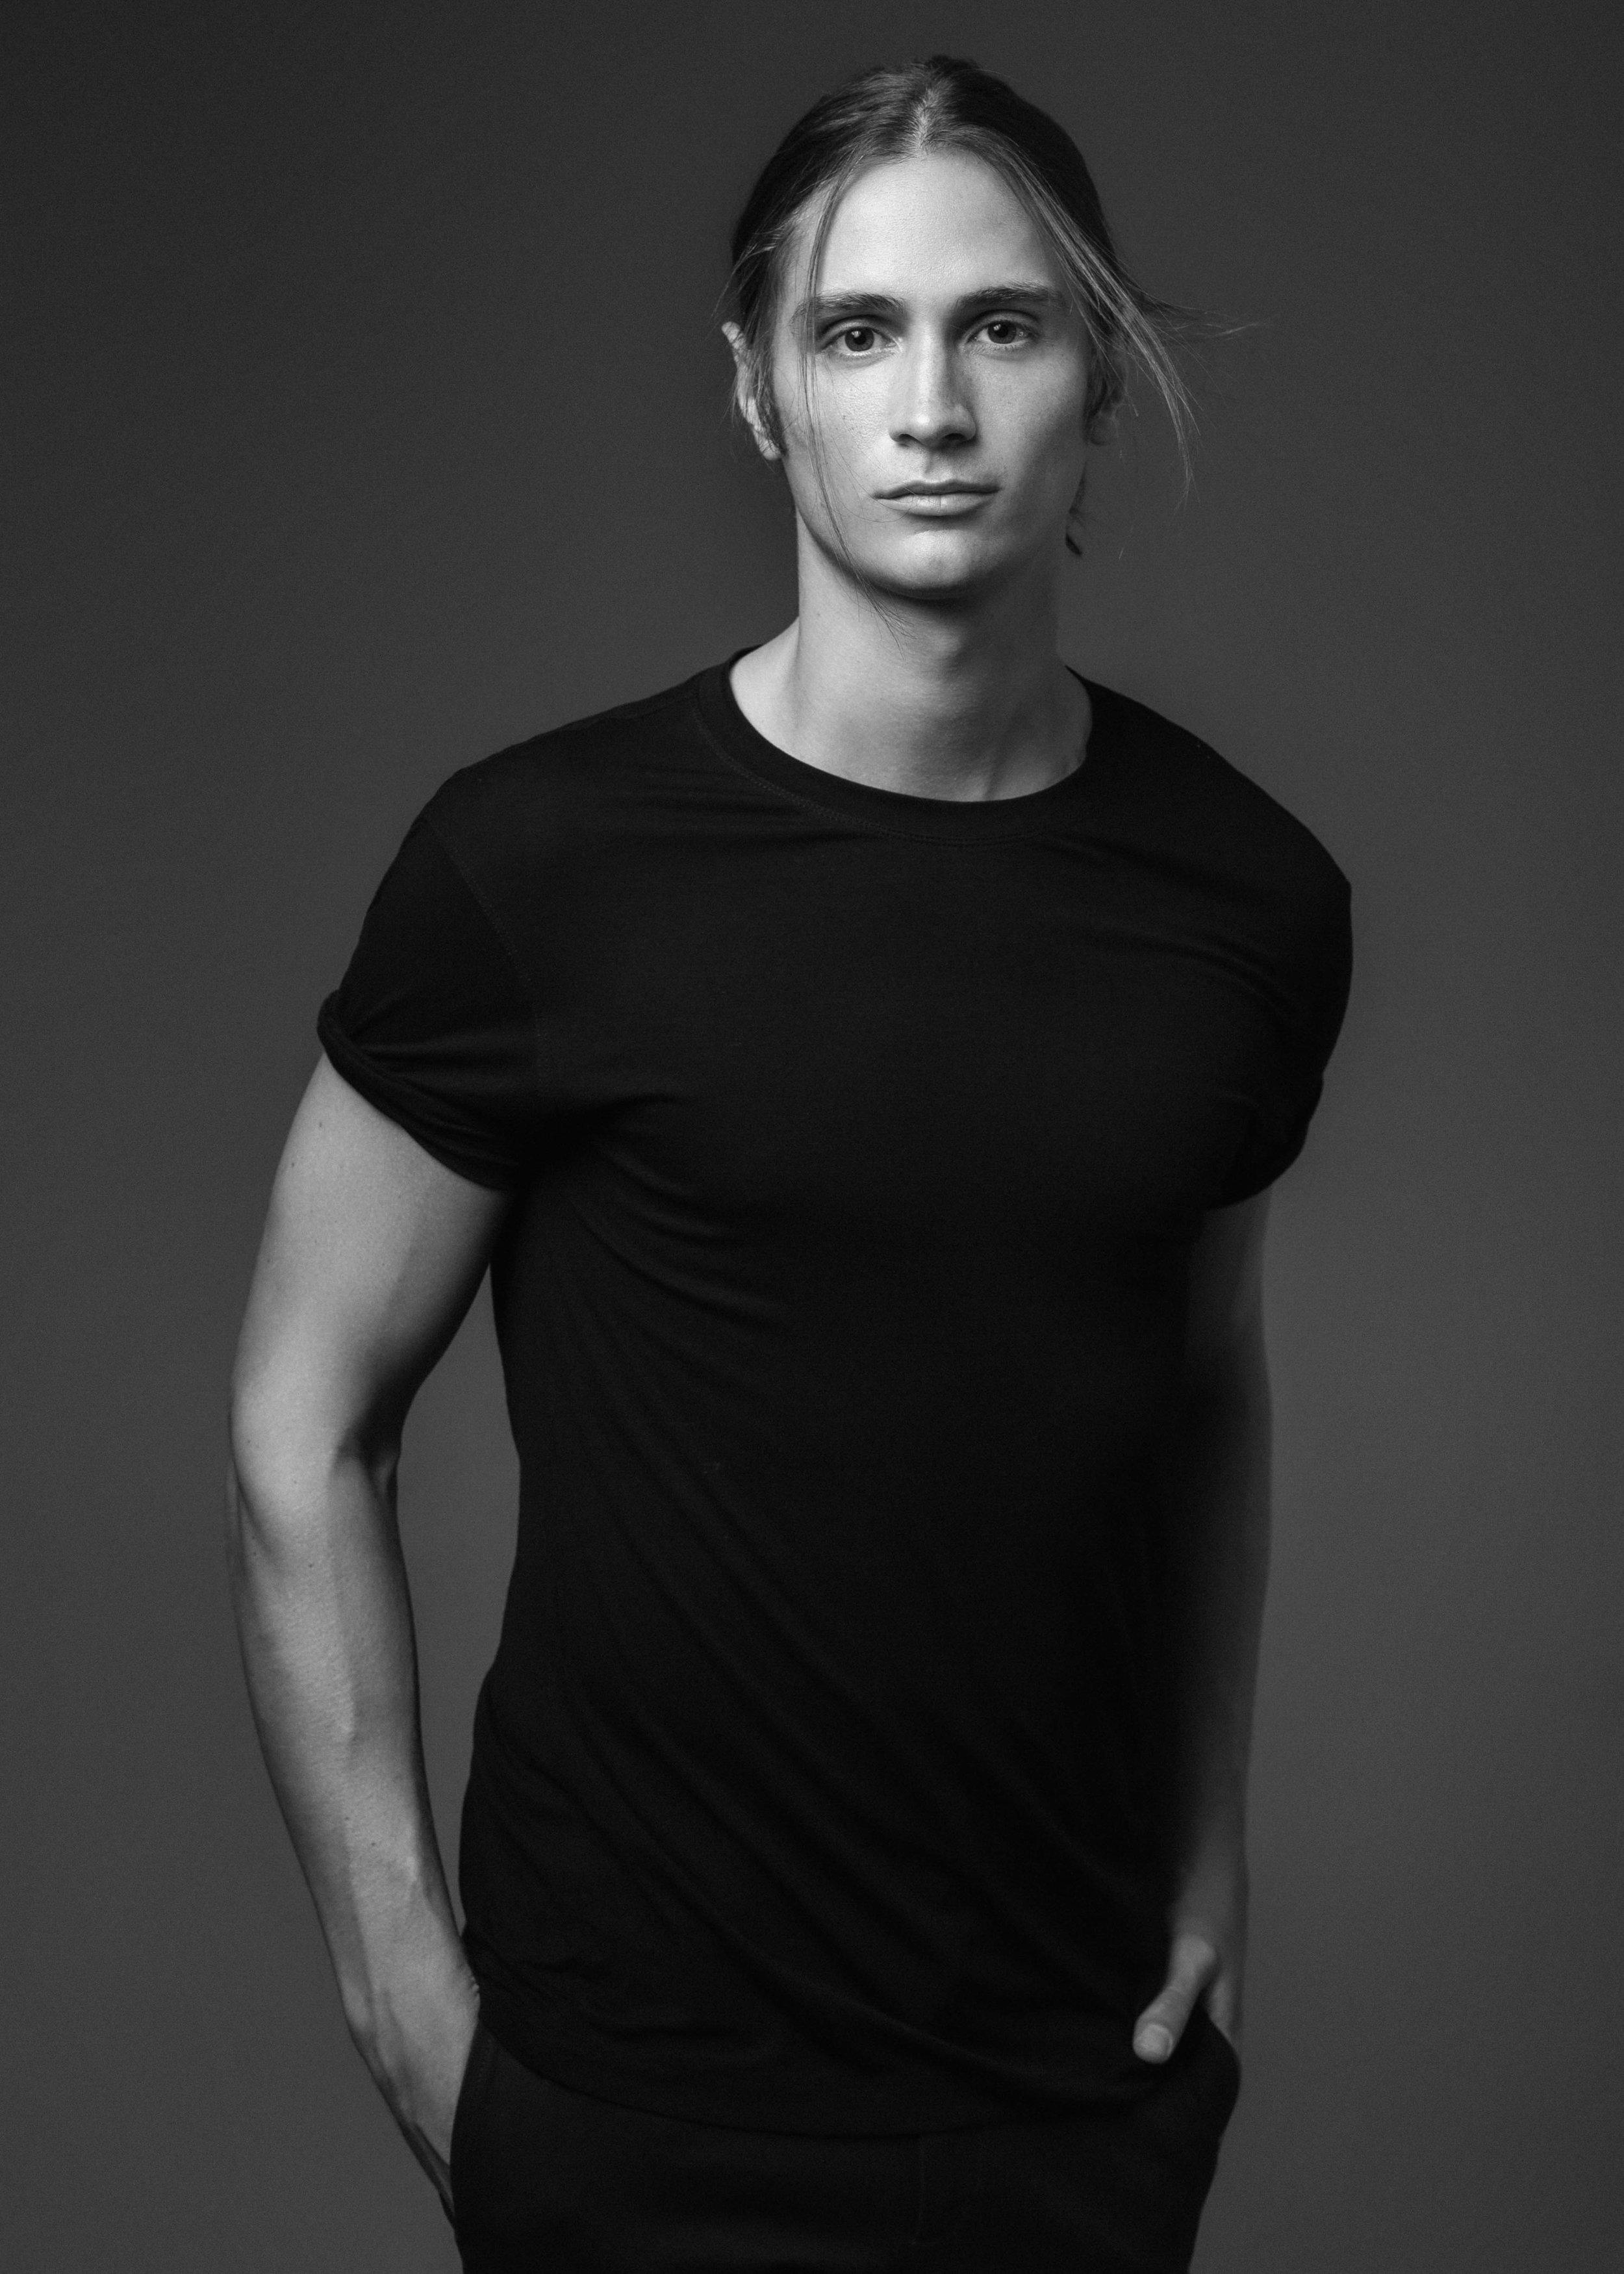 nyc-photographers-male-model-test-10022.jpg